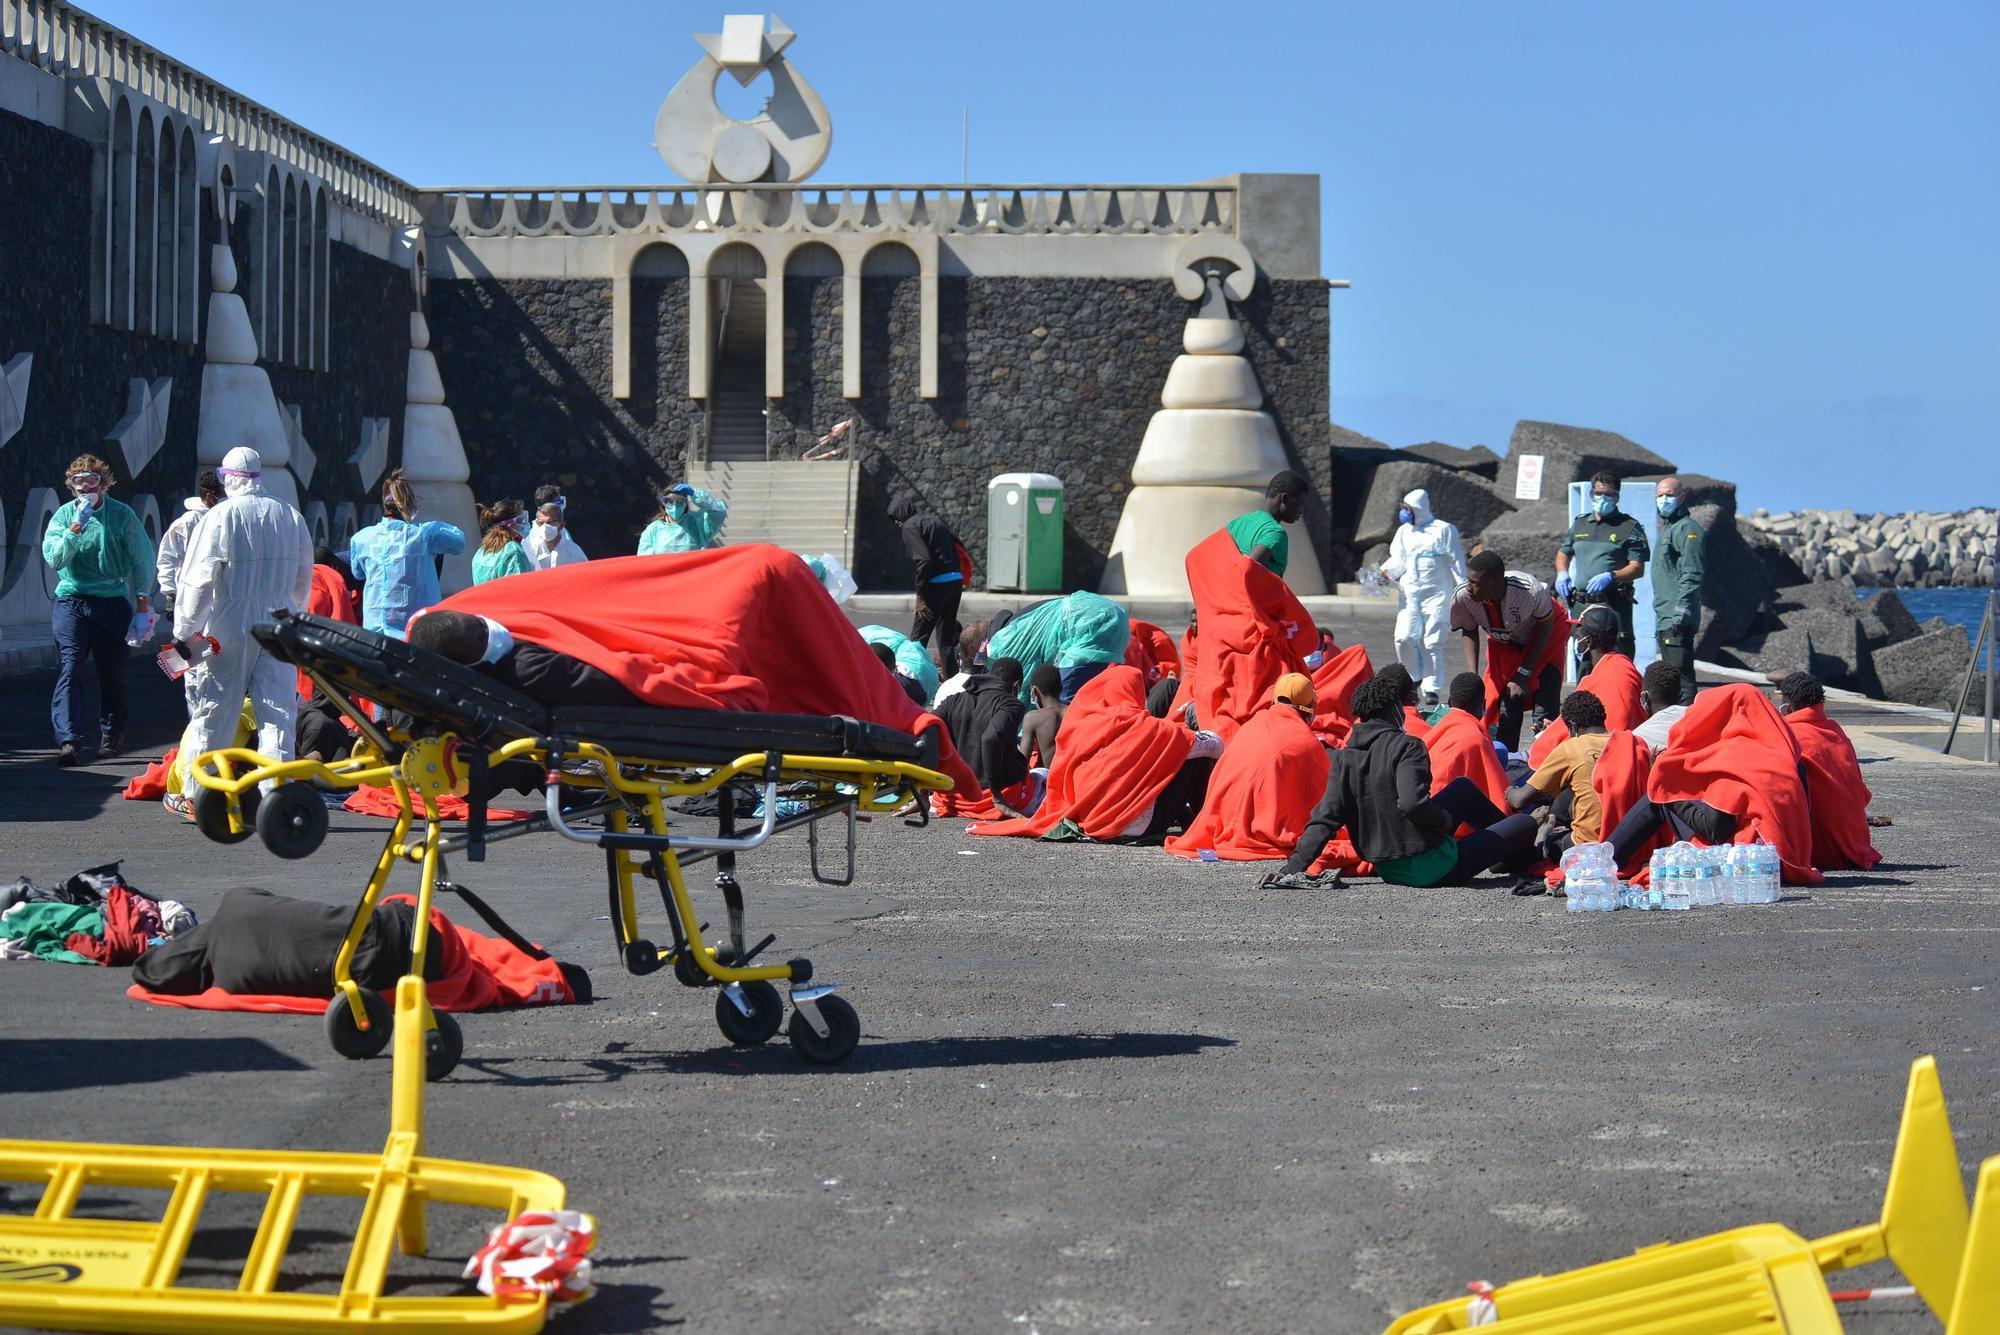 Llega un cayuco con 58 migrantes a La Restinga